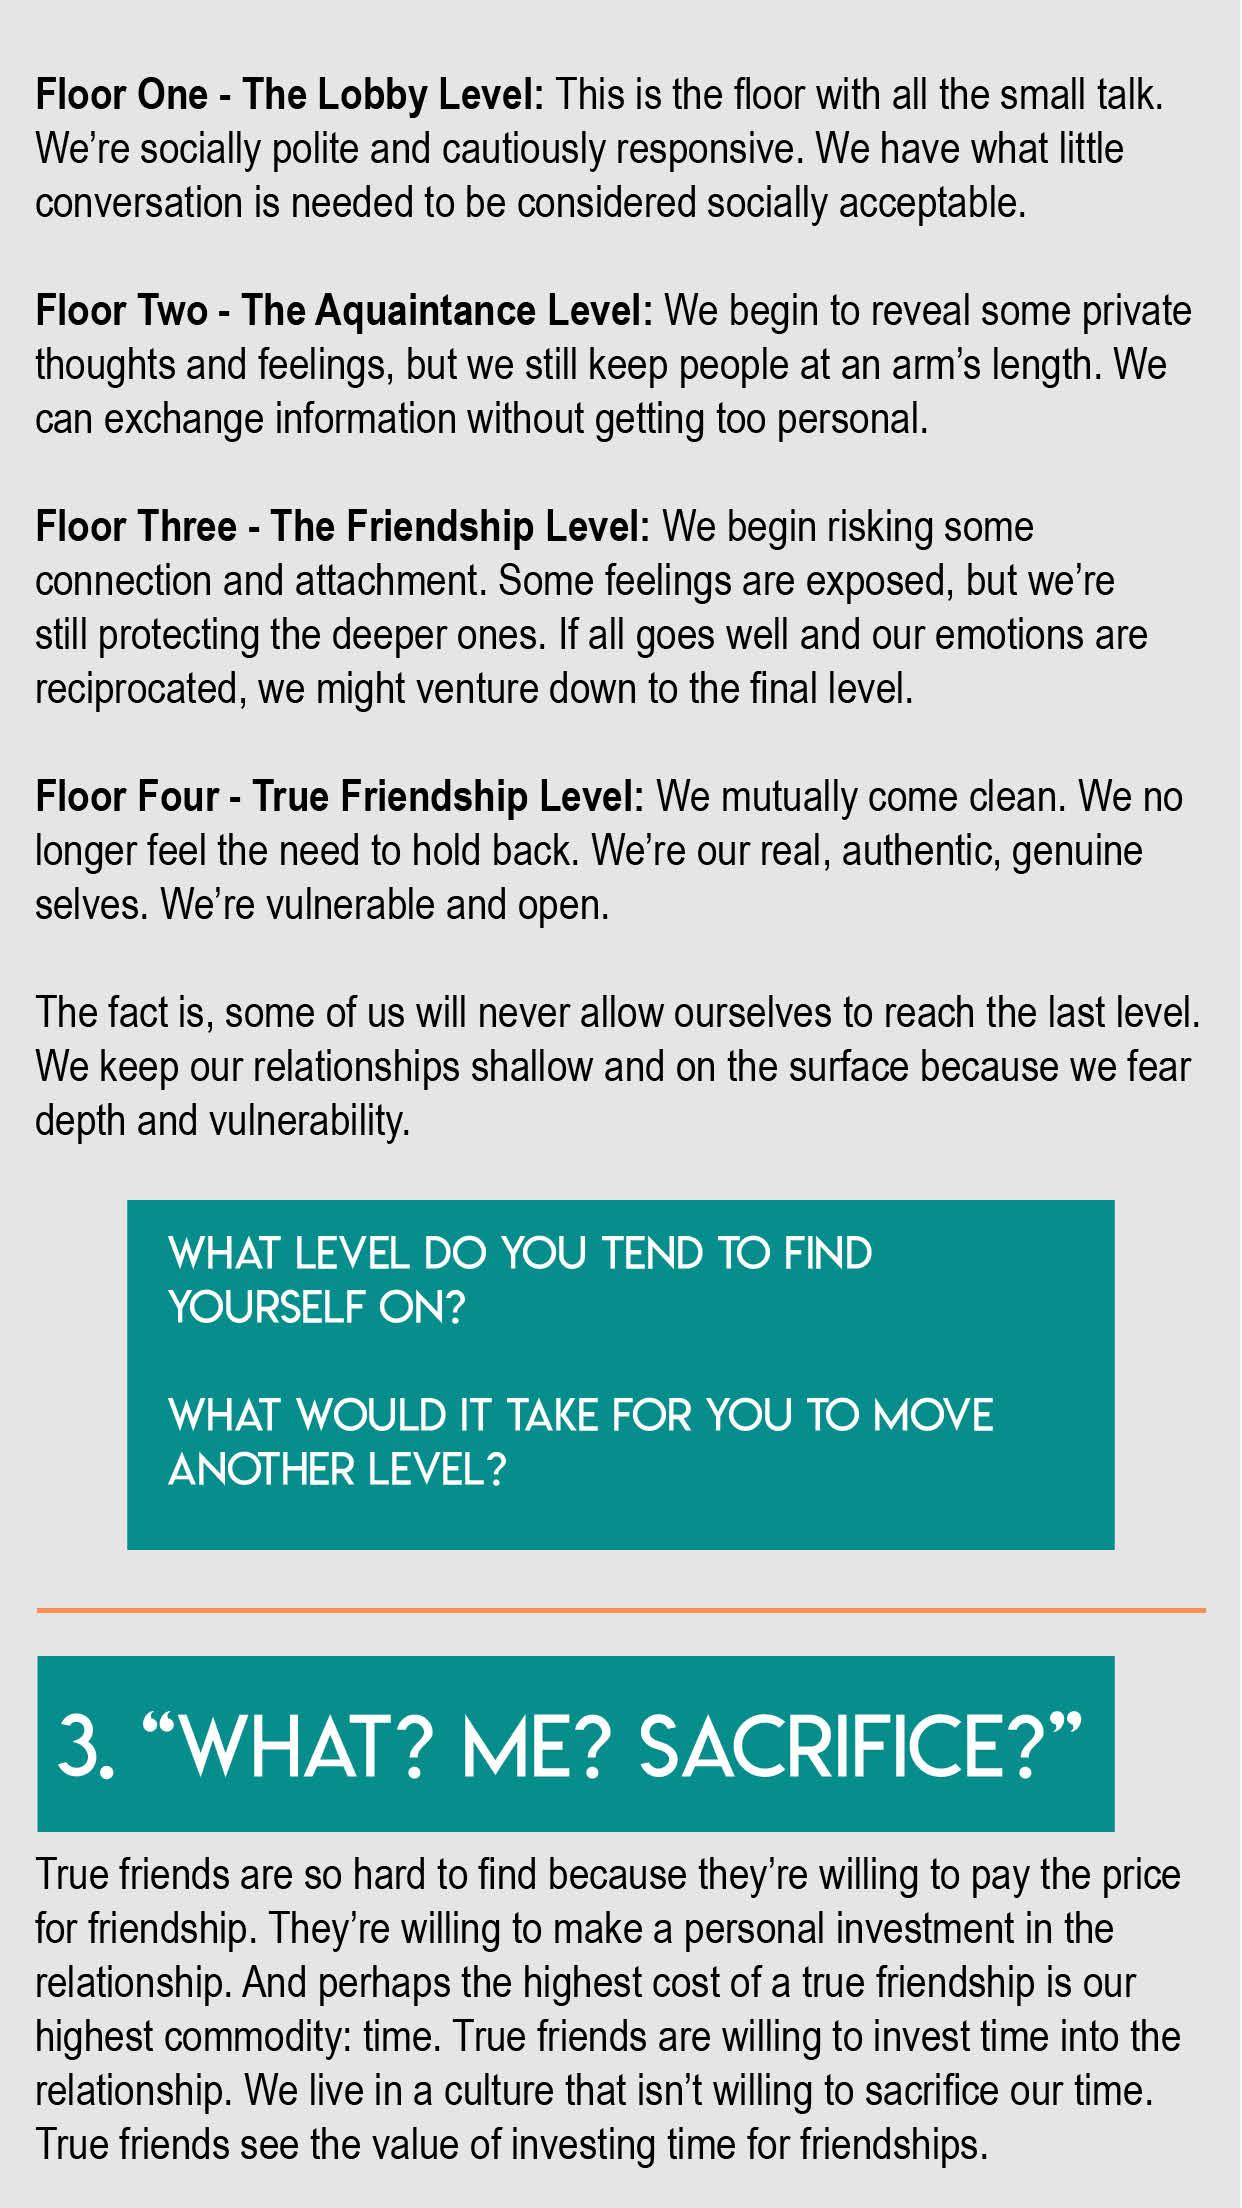 Crew Guide - True Friend5.jpg